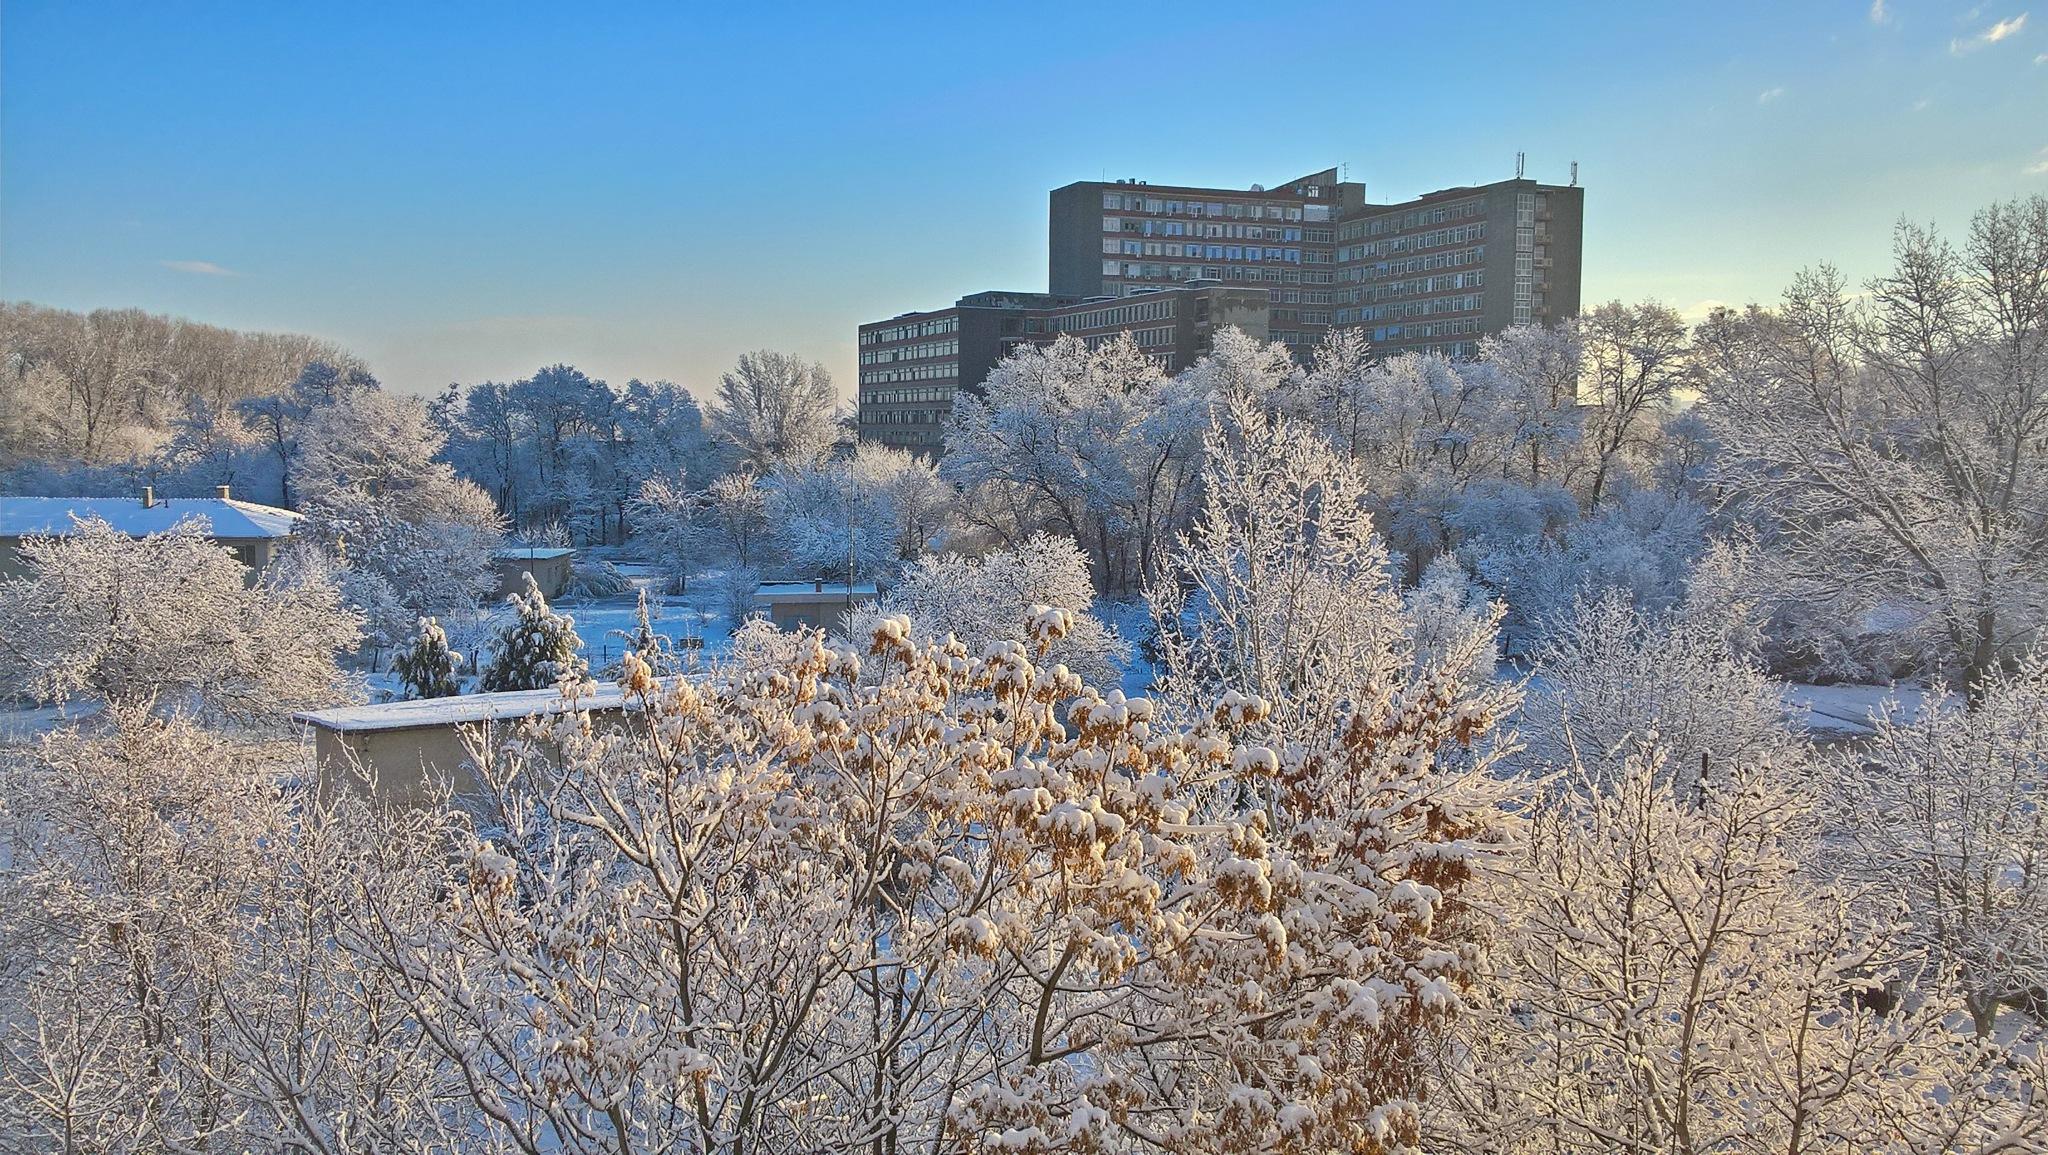 snow paradise  by Krasi Asenov